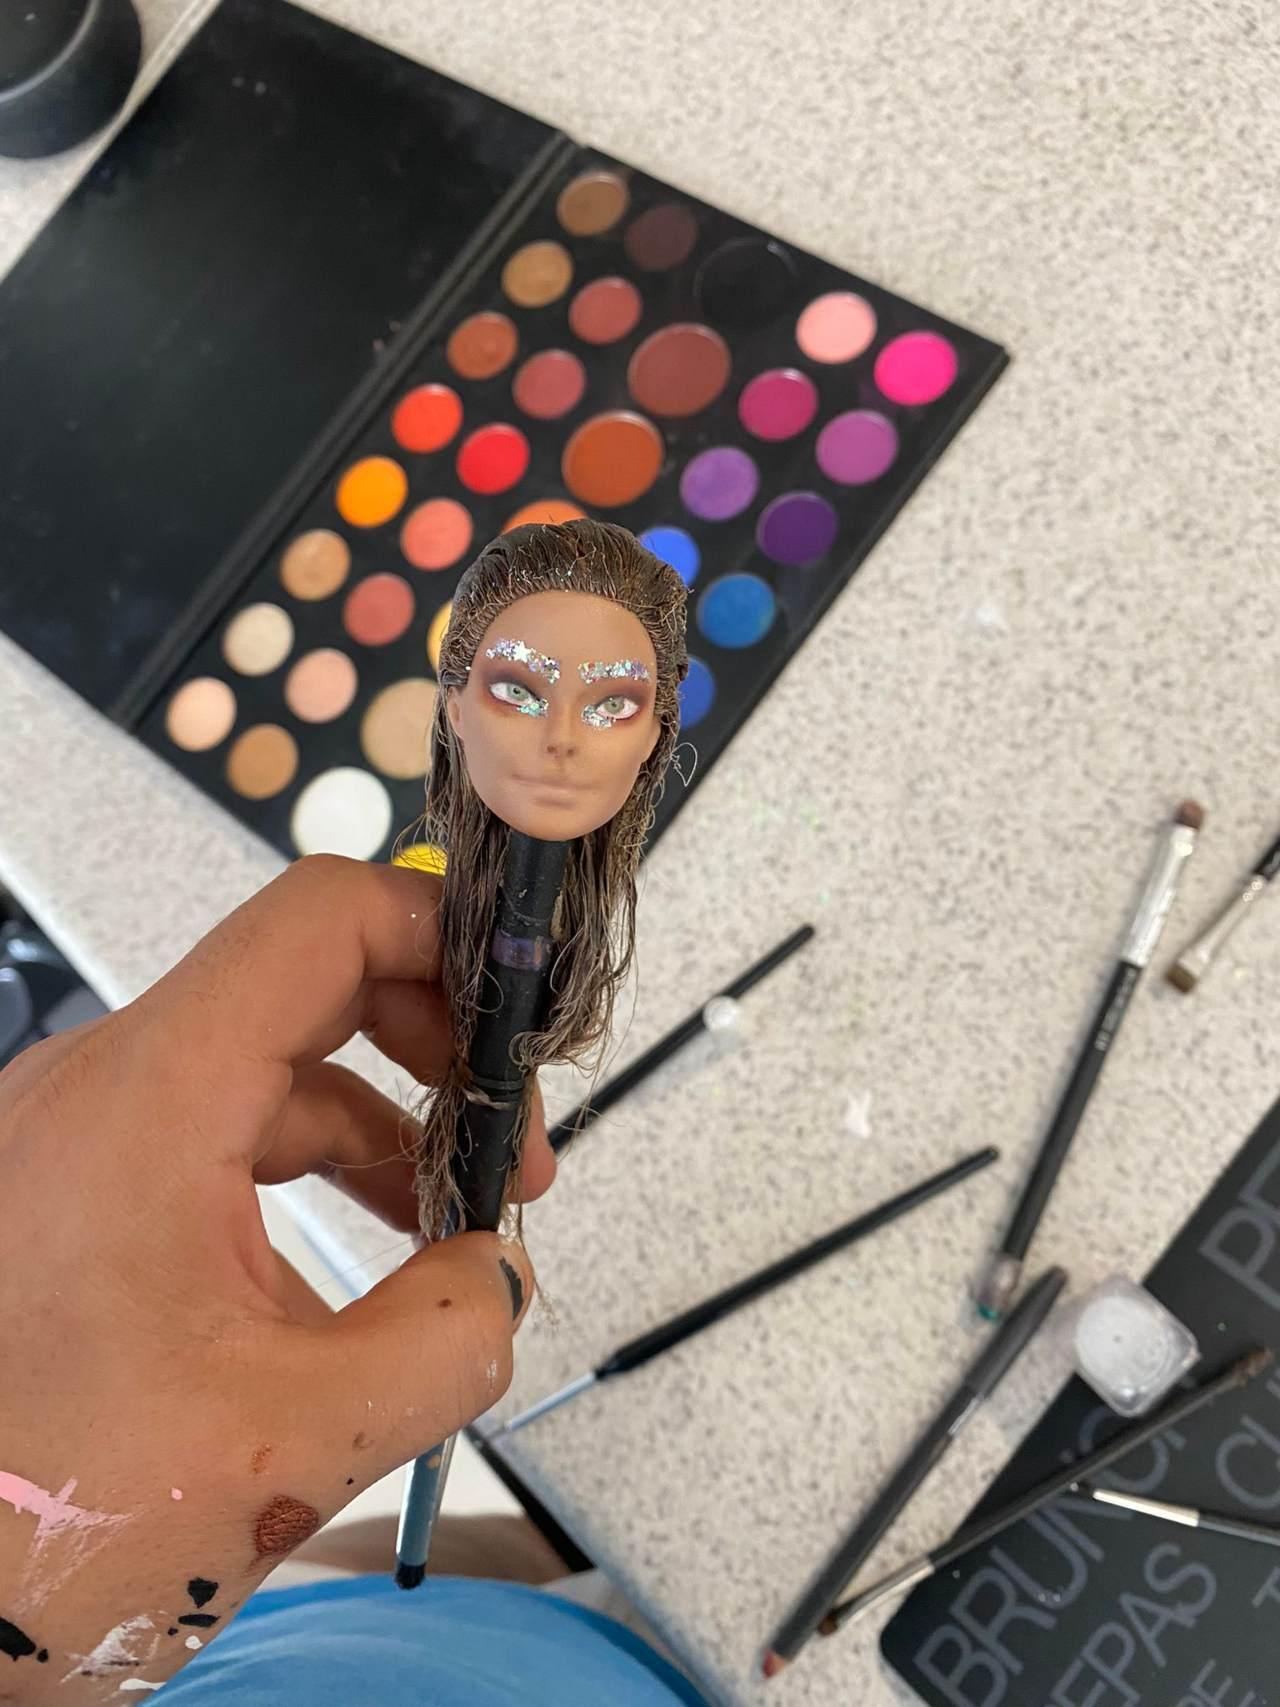 Barbie transformacion en Belinda usuario Twitter